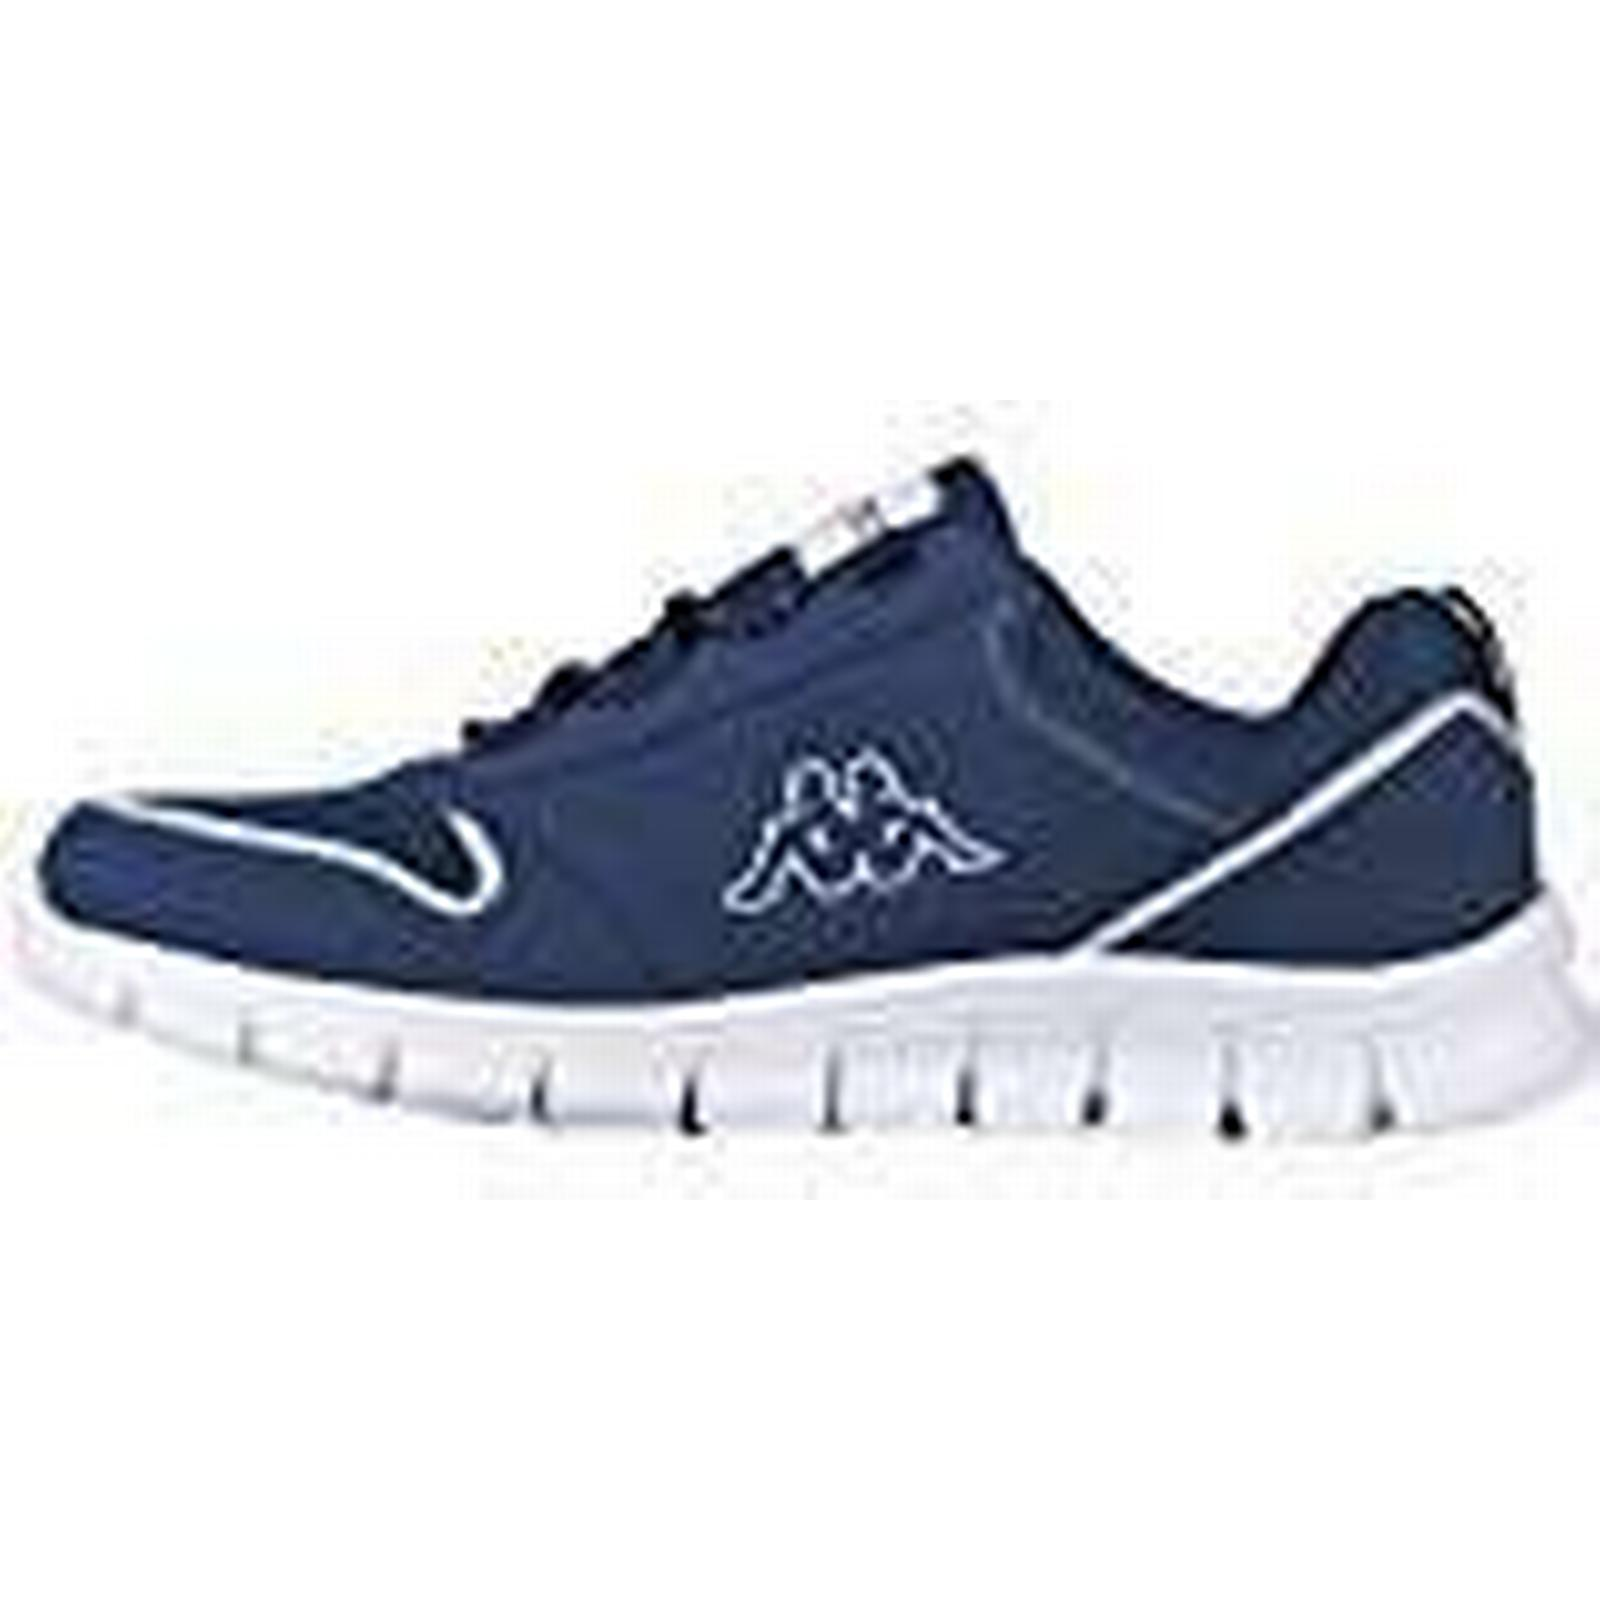 Kappa Blue Unisex Adults' Amora Low-Top Sneakers, Blue Kappa (6710 Navy/White), 6.5 UK 3c4044